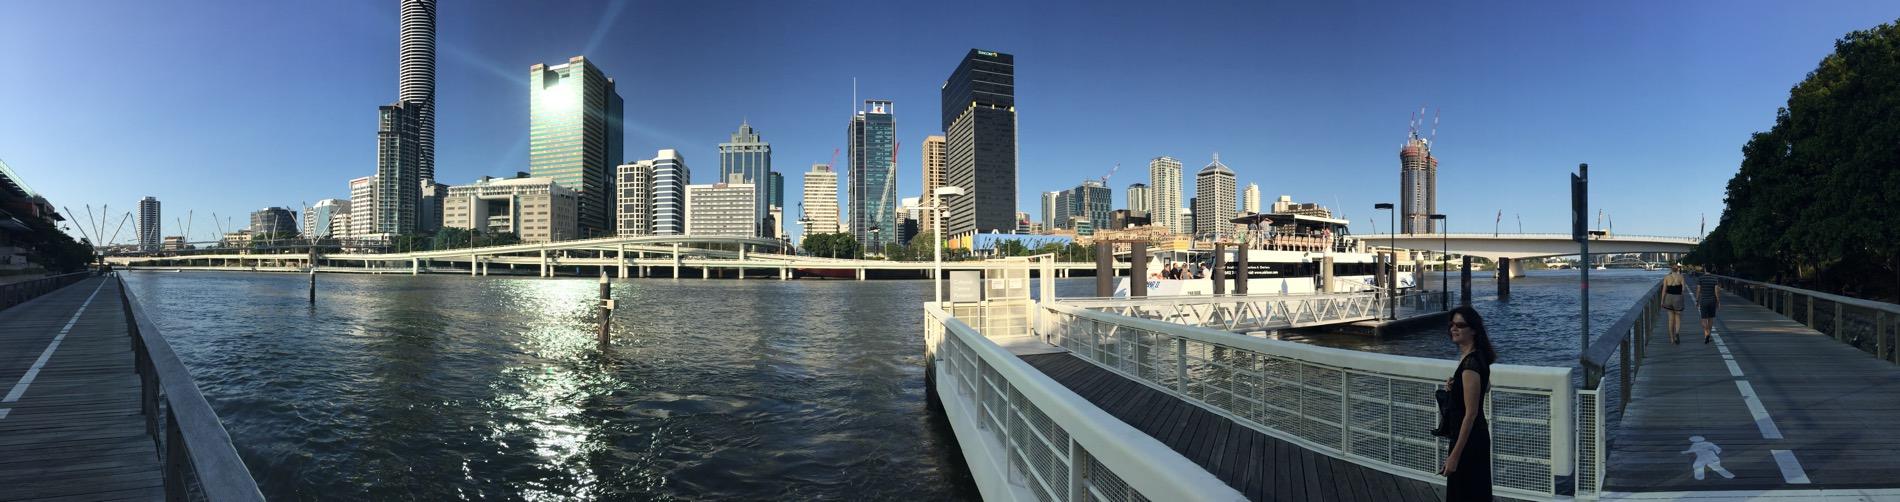 Minnik Chartered Accountants - Brisbane